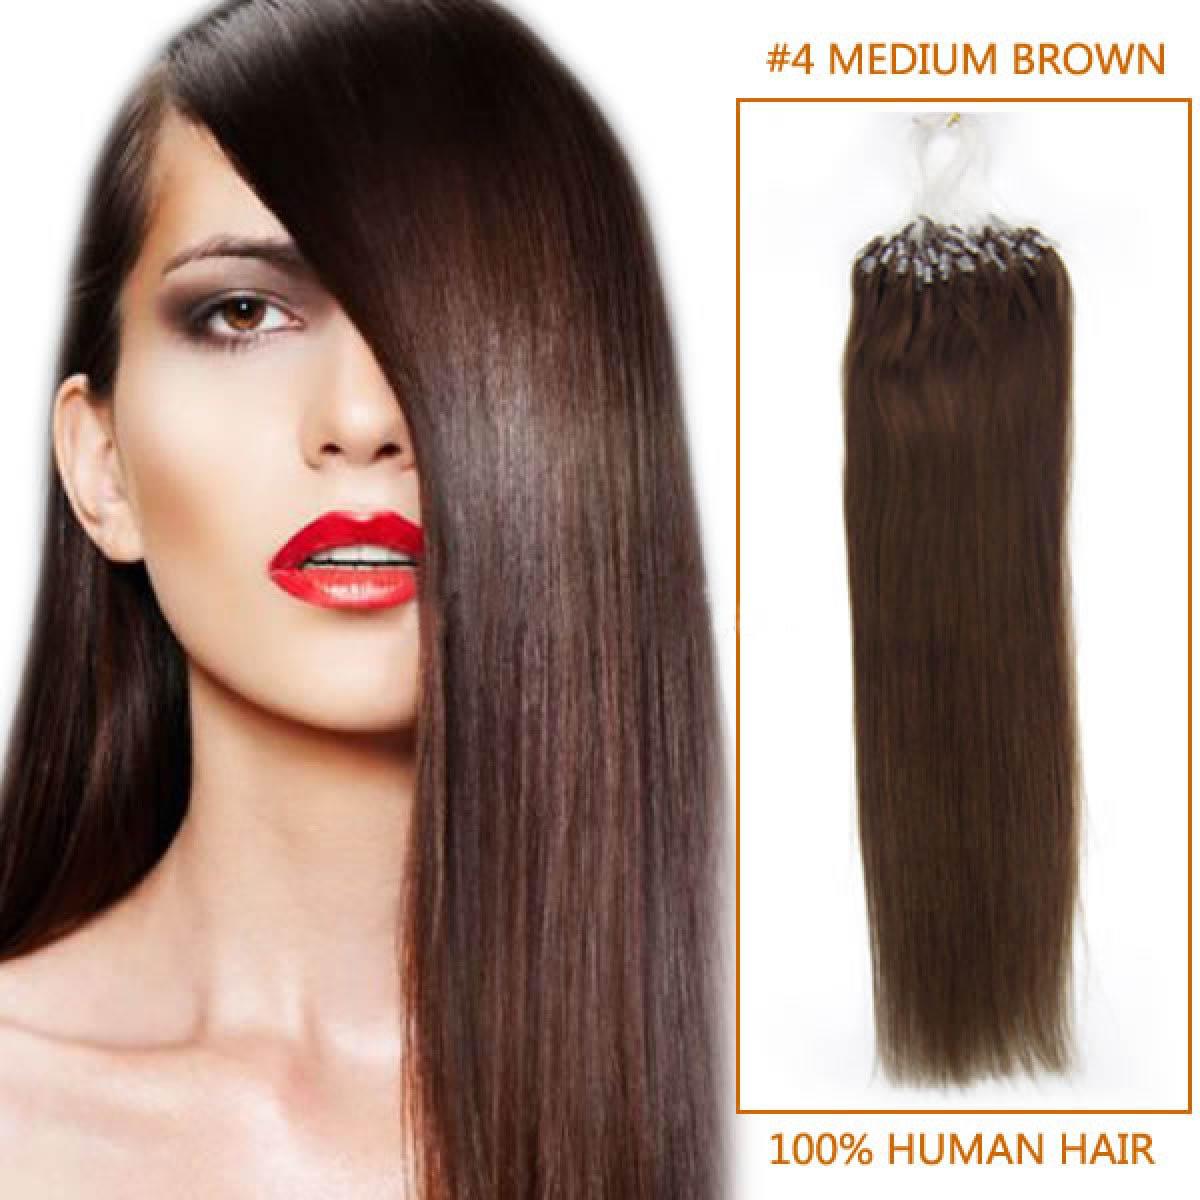 Inch 4 medium brown micro loop human hair extensions 100s 100g 16 inch 4 medium brown micro loop human hair extensions 100s 100g pmusecretfo Image collections